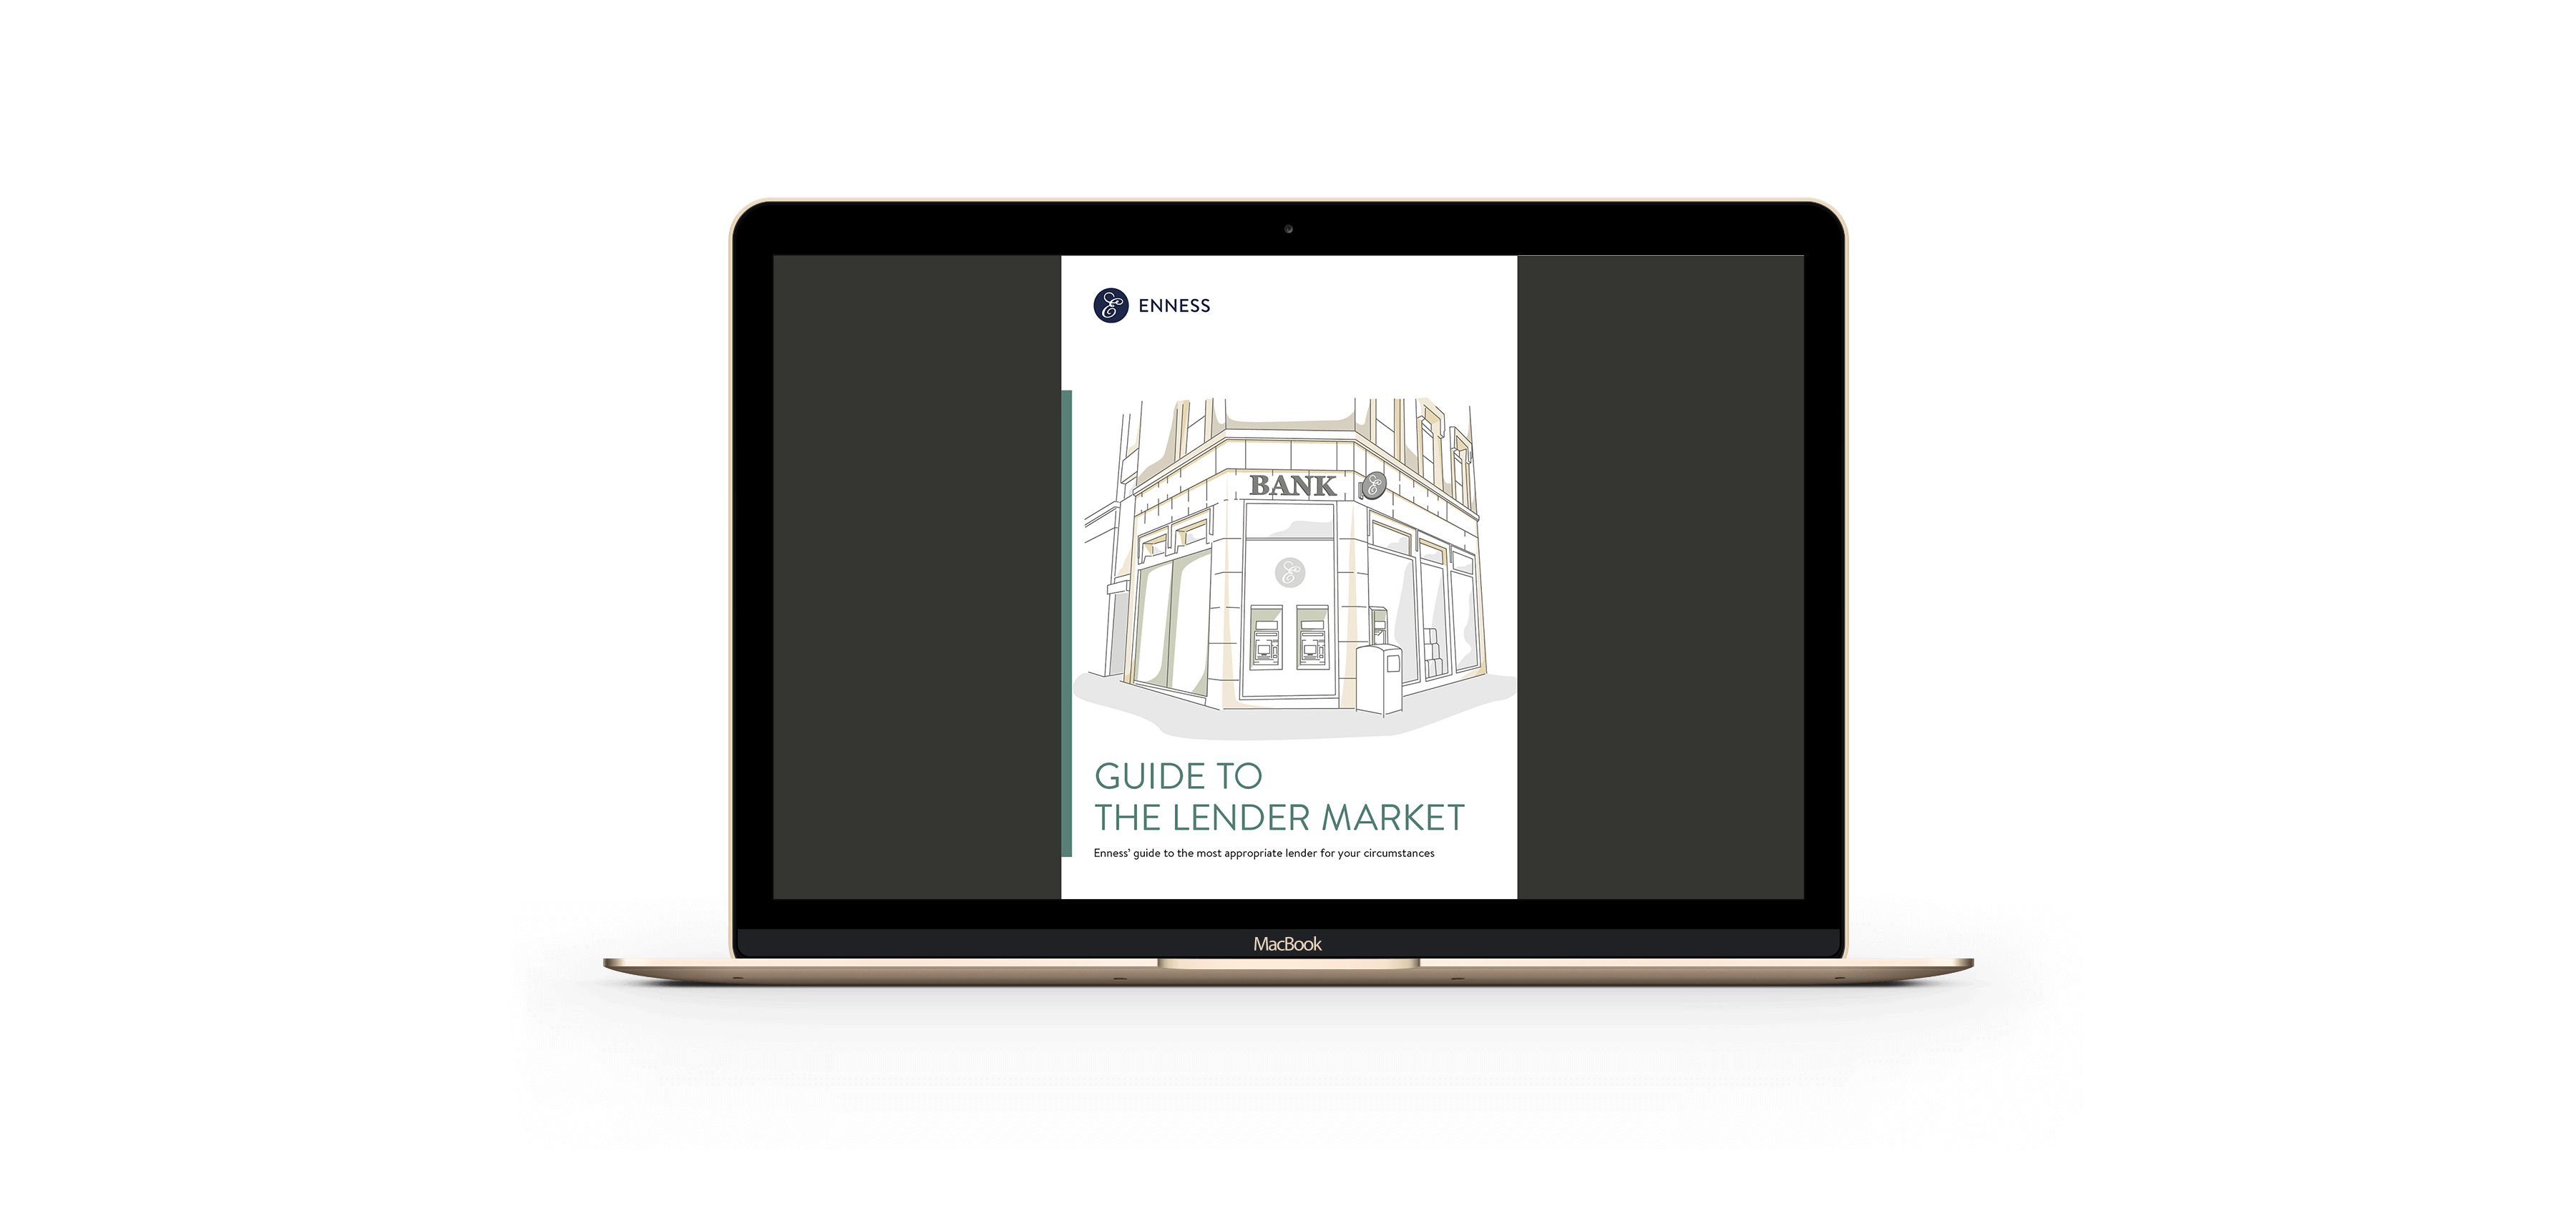 Lenders_Guide_ibook.png